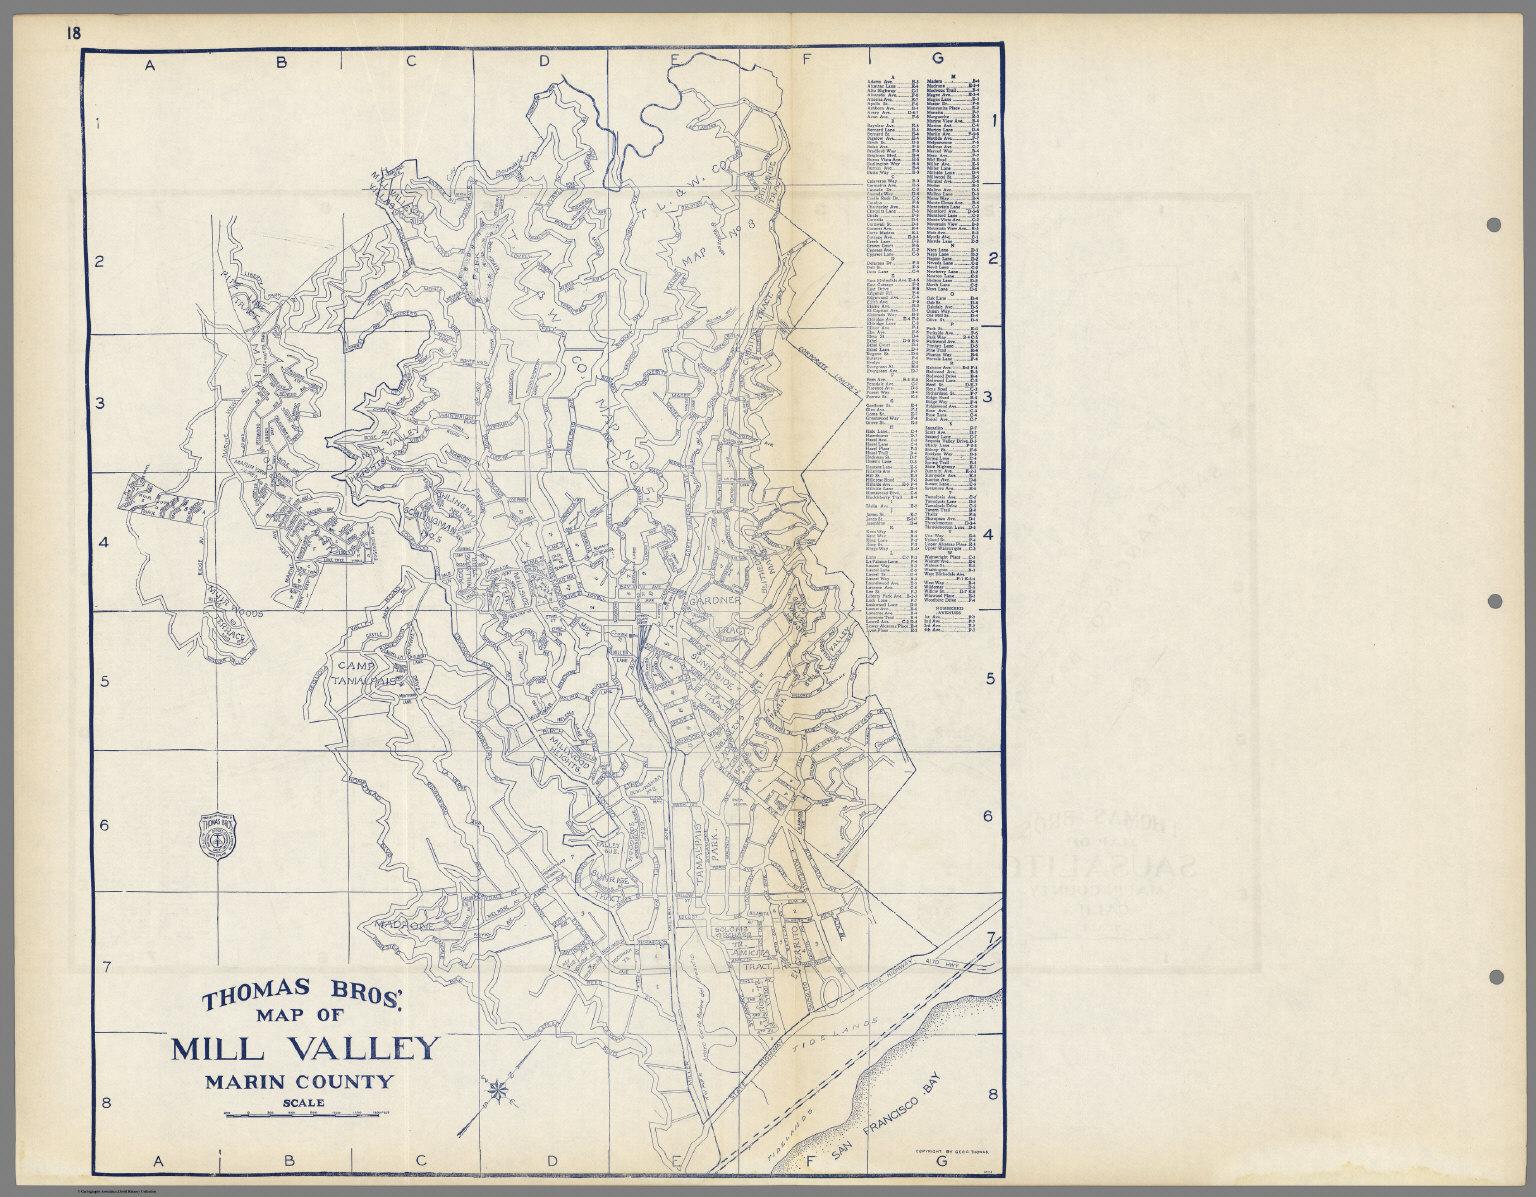 Thomas Bros Map Of Mill Valley Marin County California David